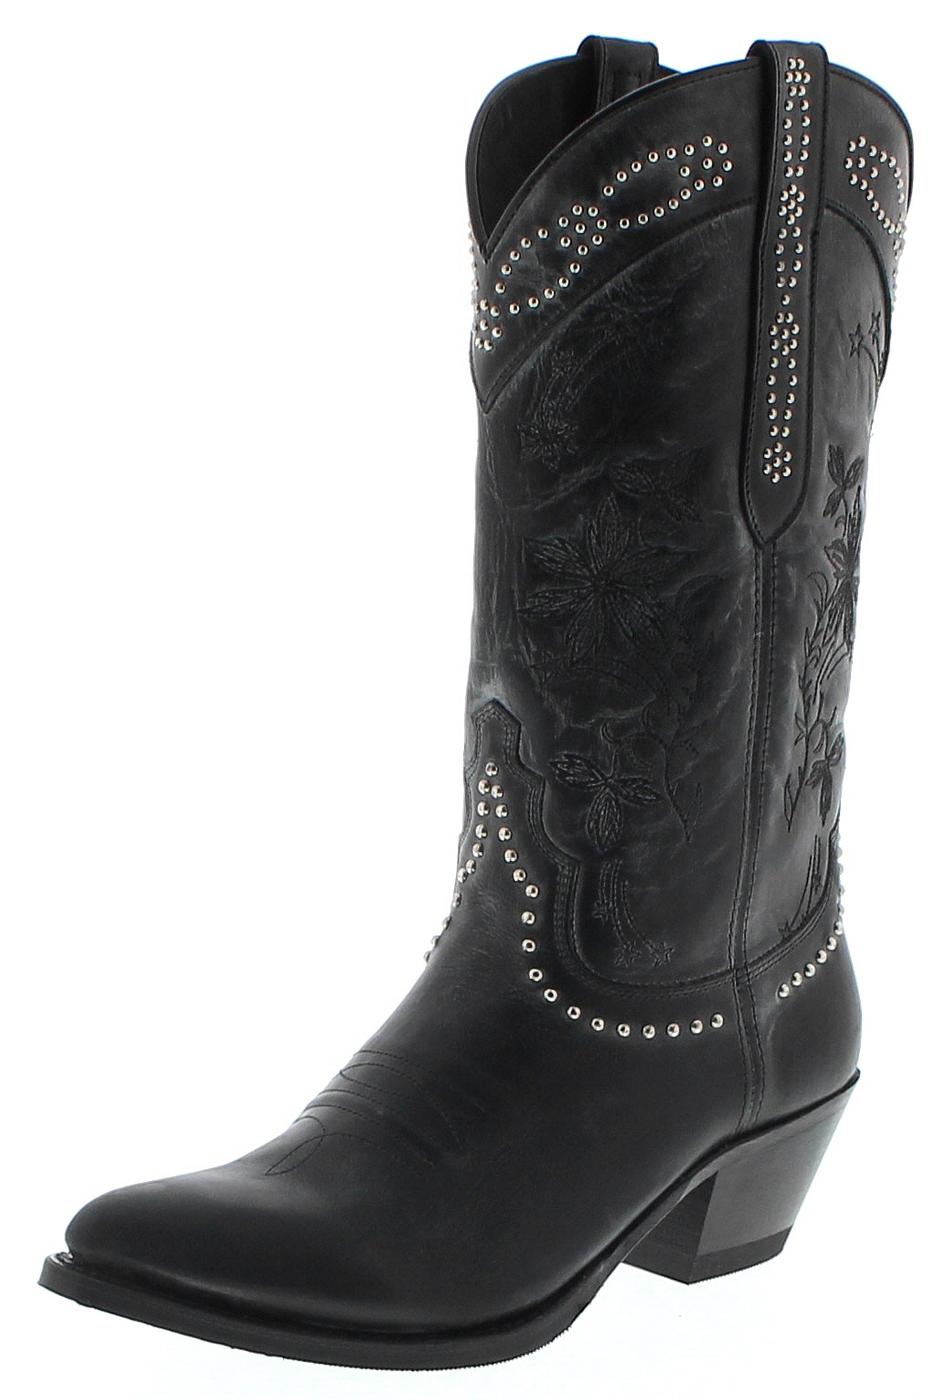 Sendra Boots 15500 Negro Damen Westernstiefel - schwarz